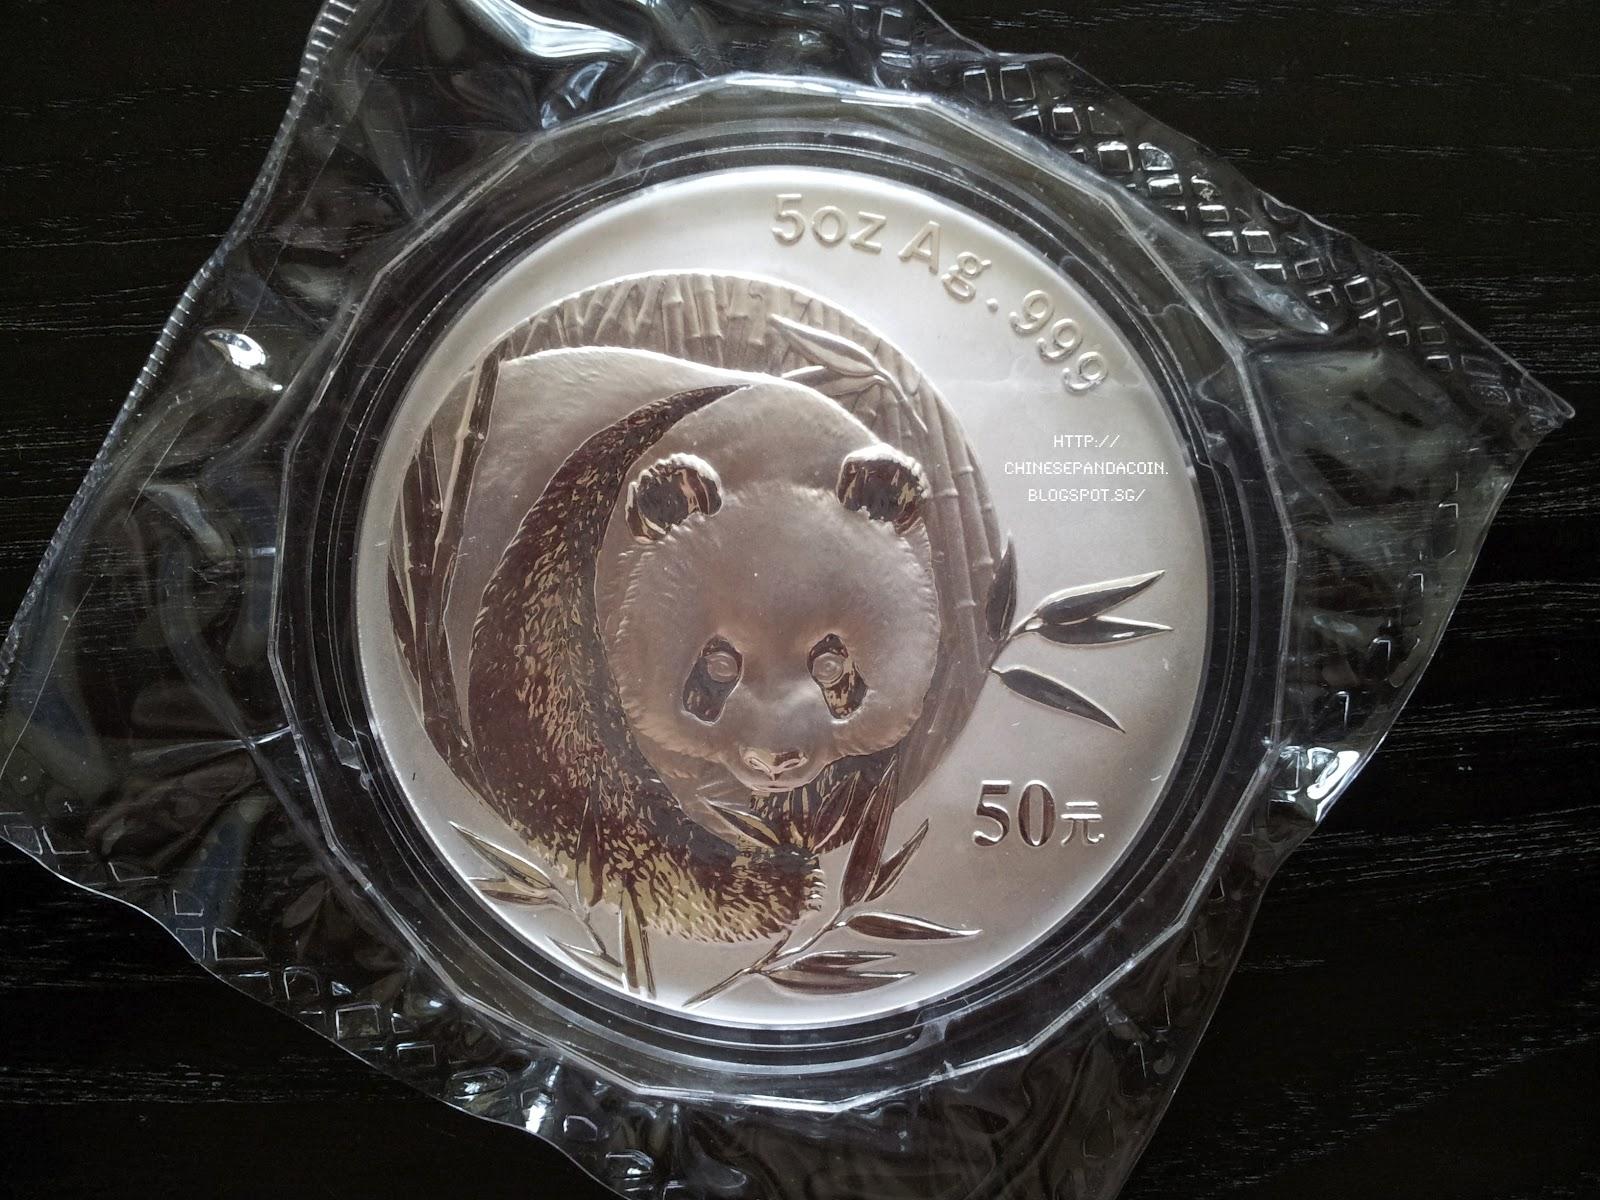 Chinese Panda Coin 2003 5 Oz Silver Panda